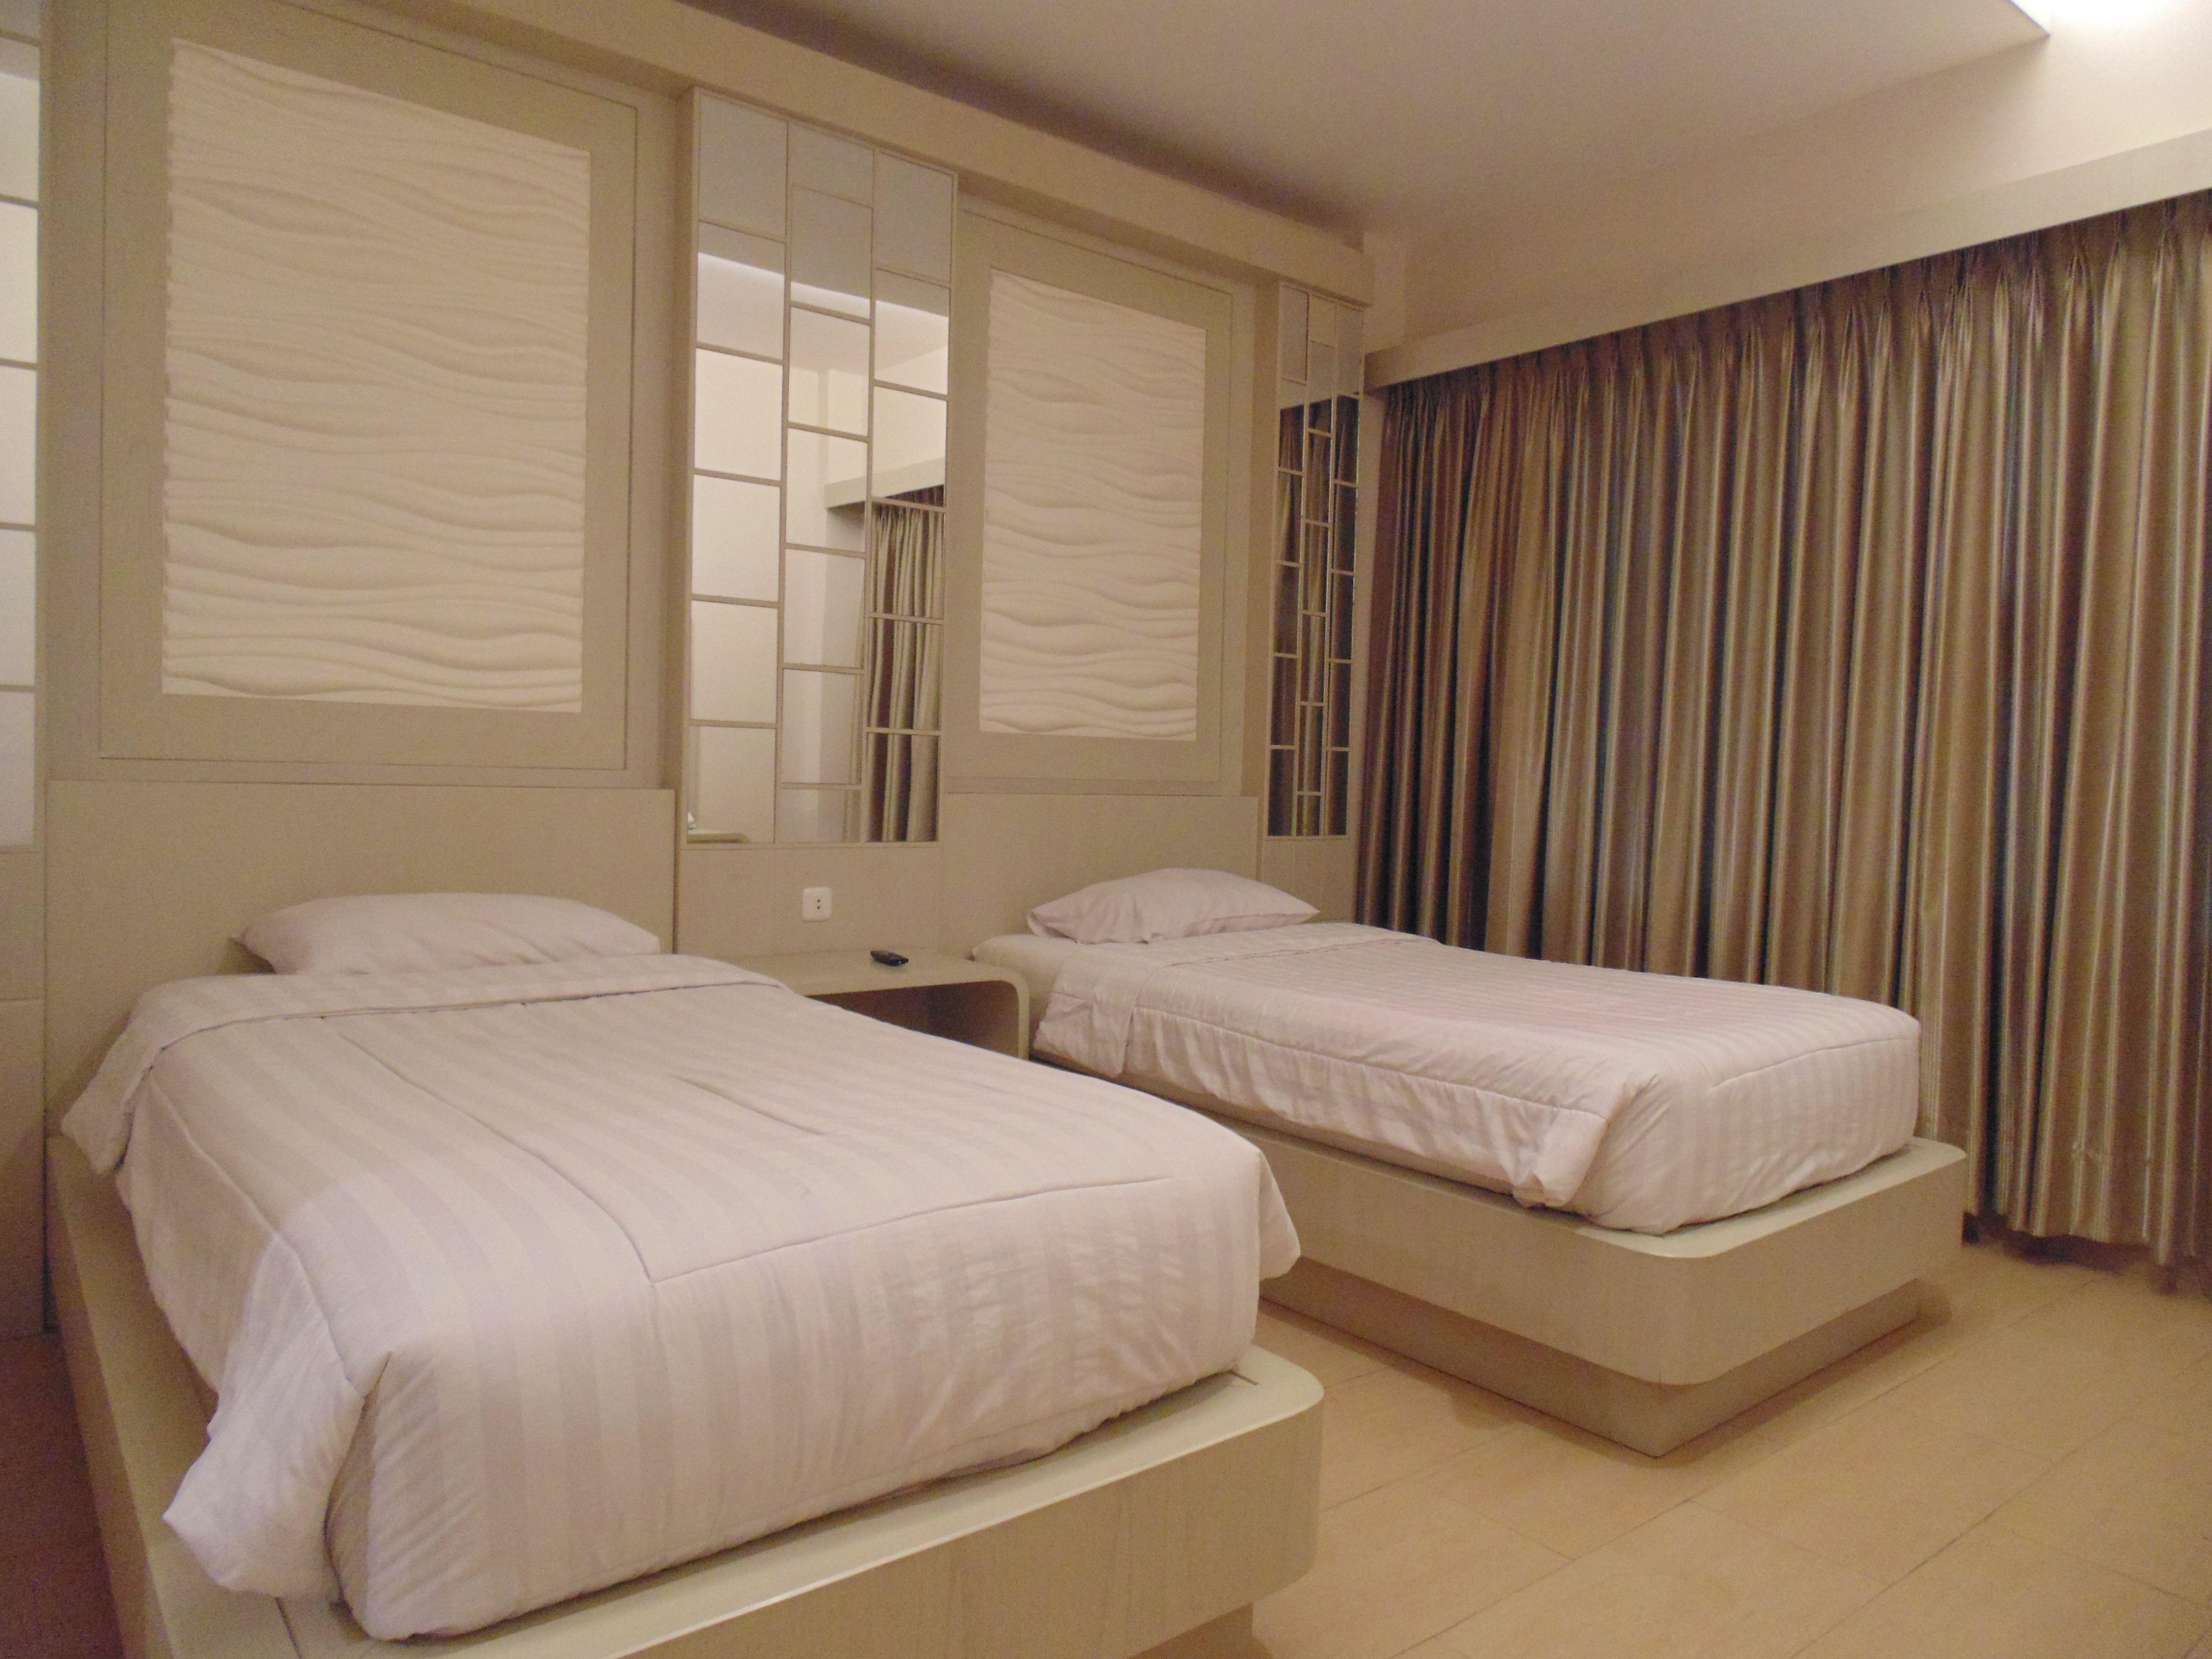 Arnes Central Hotel, Bandar Lampung